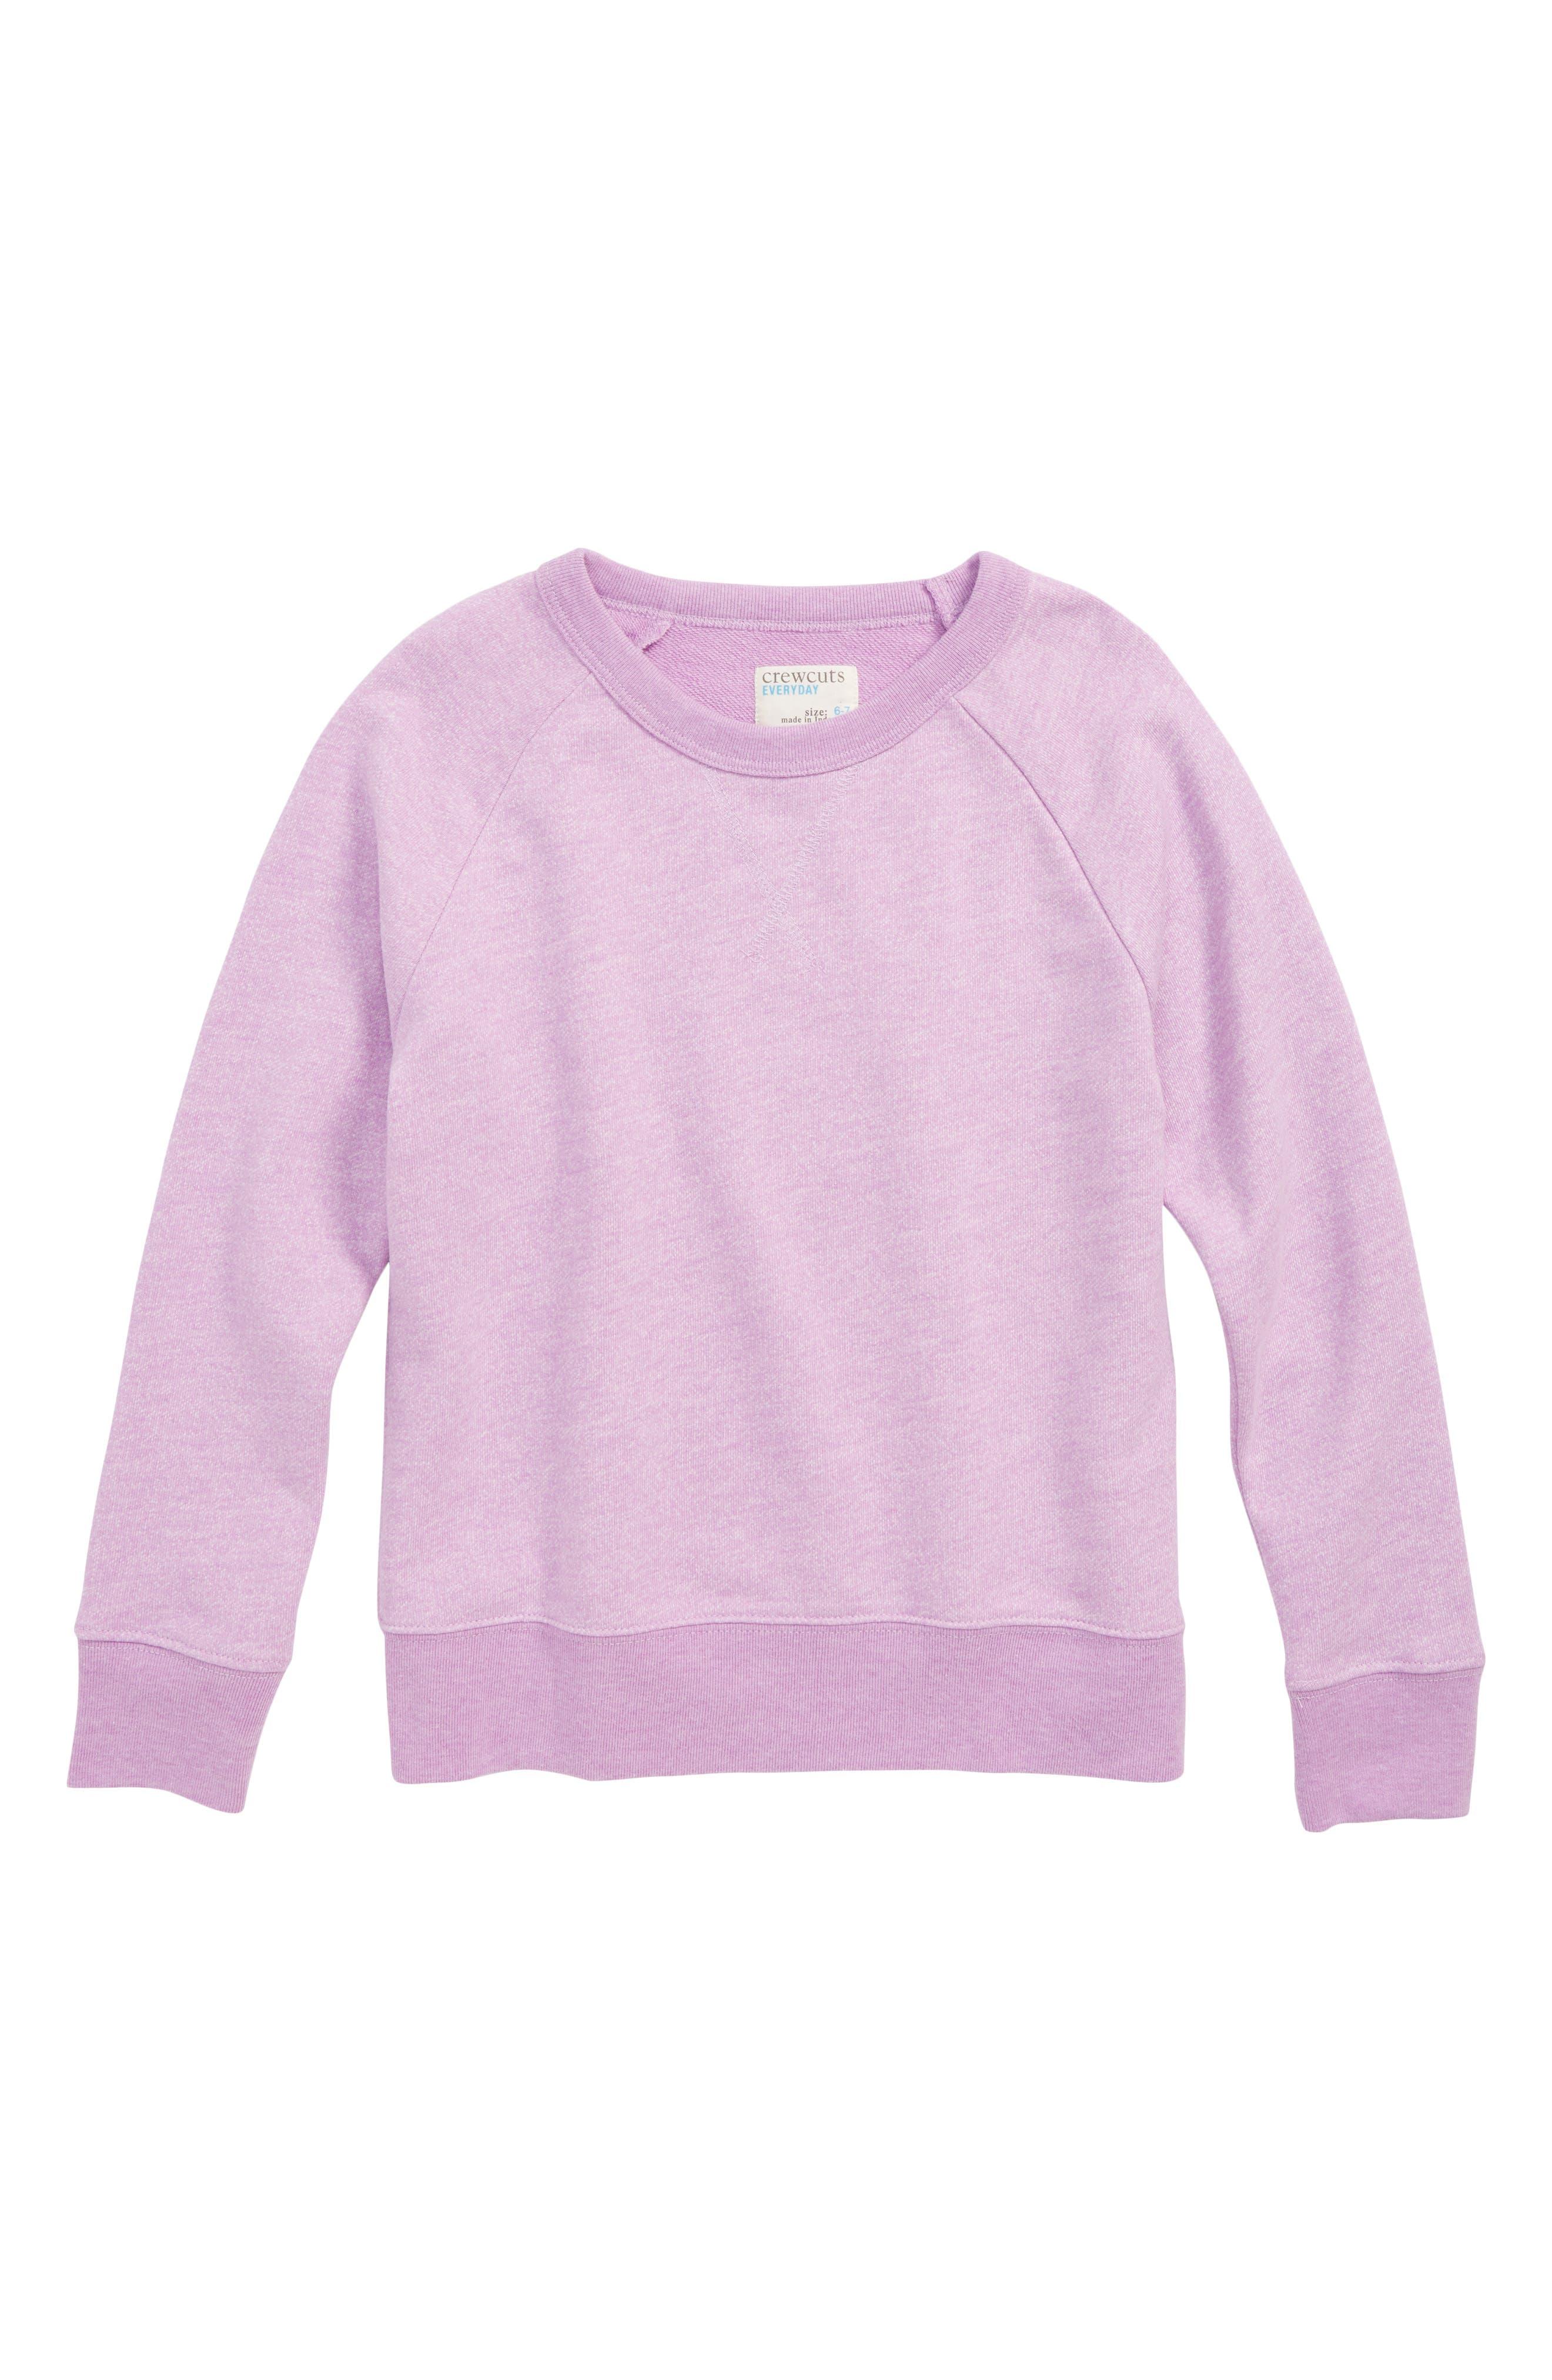 Crewneck Sweatshirt,                             Main thumbnail 1, color,                             SUNDRENCHED POOL